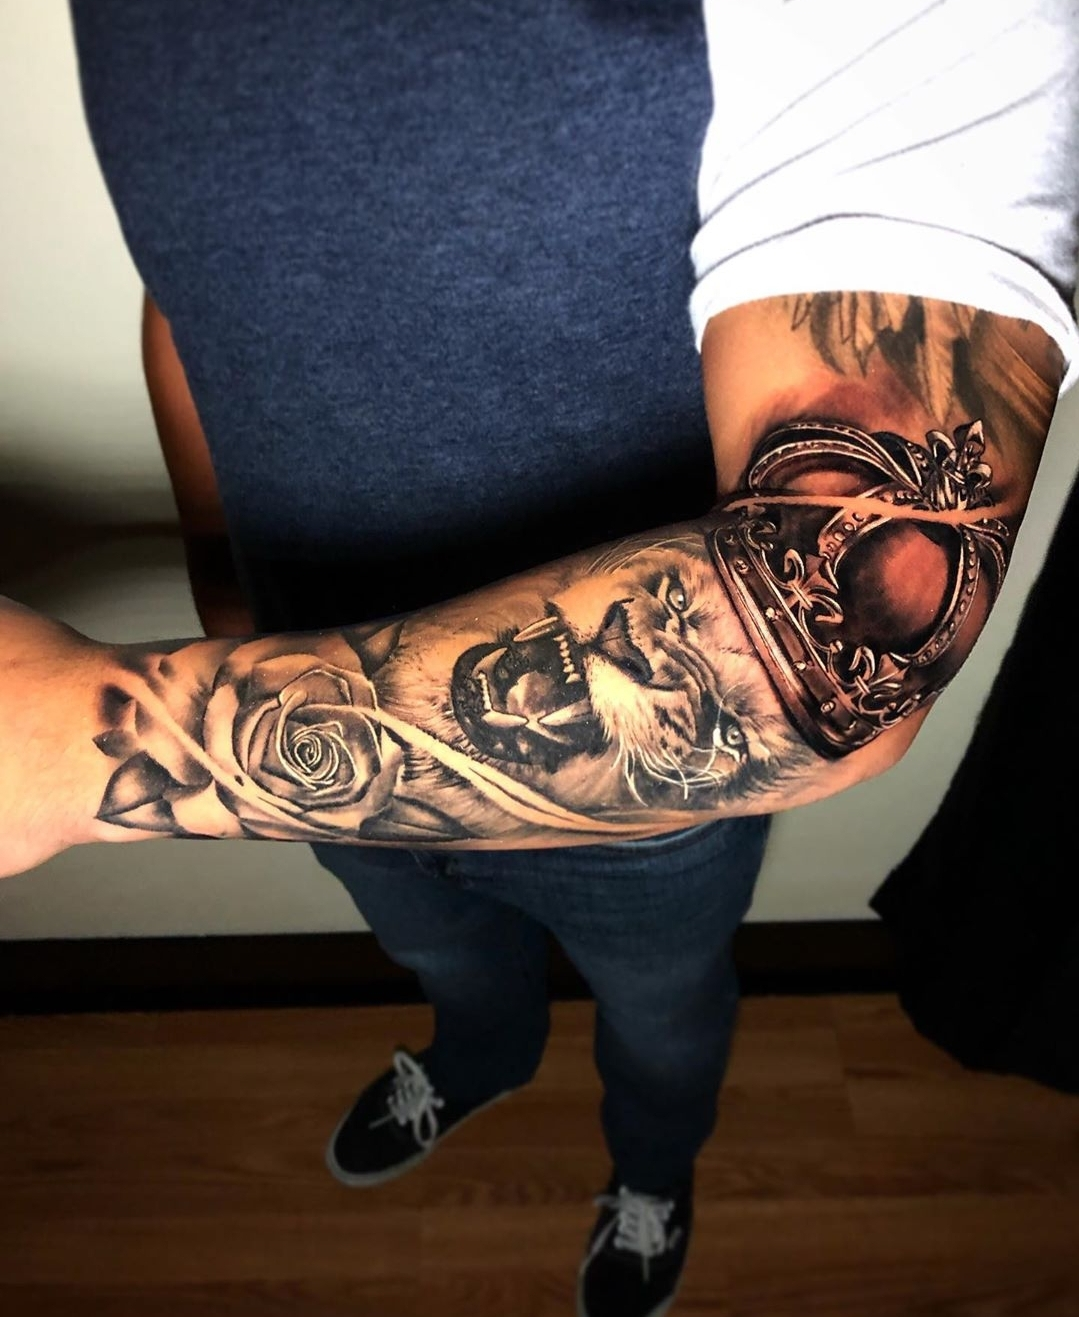 Lion Forearm Tattoo by Tattoo Artist Alec Turner